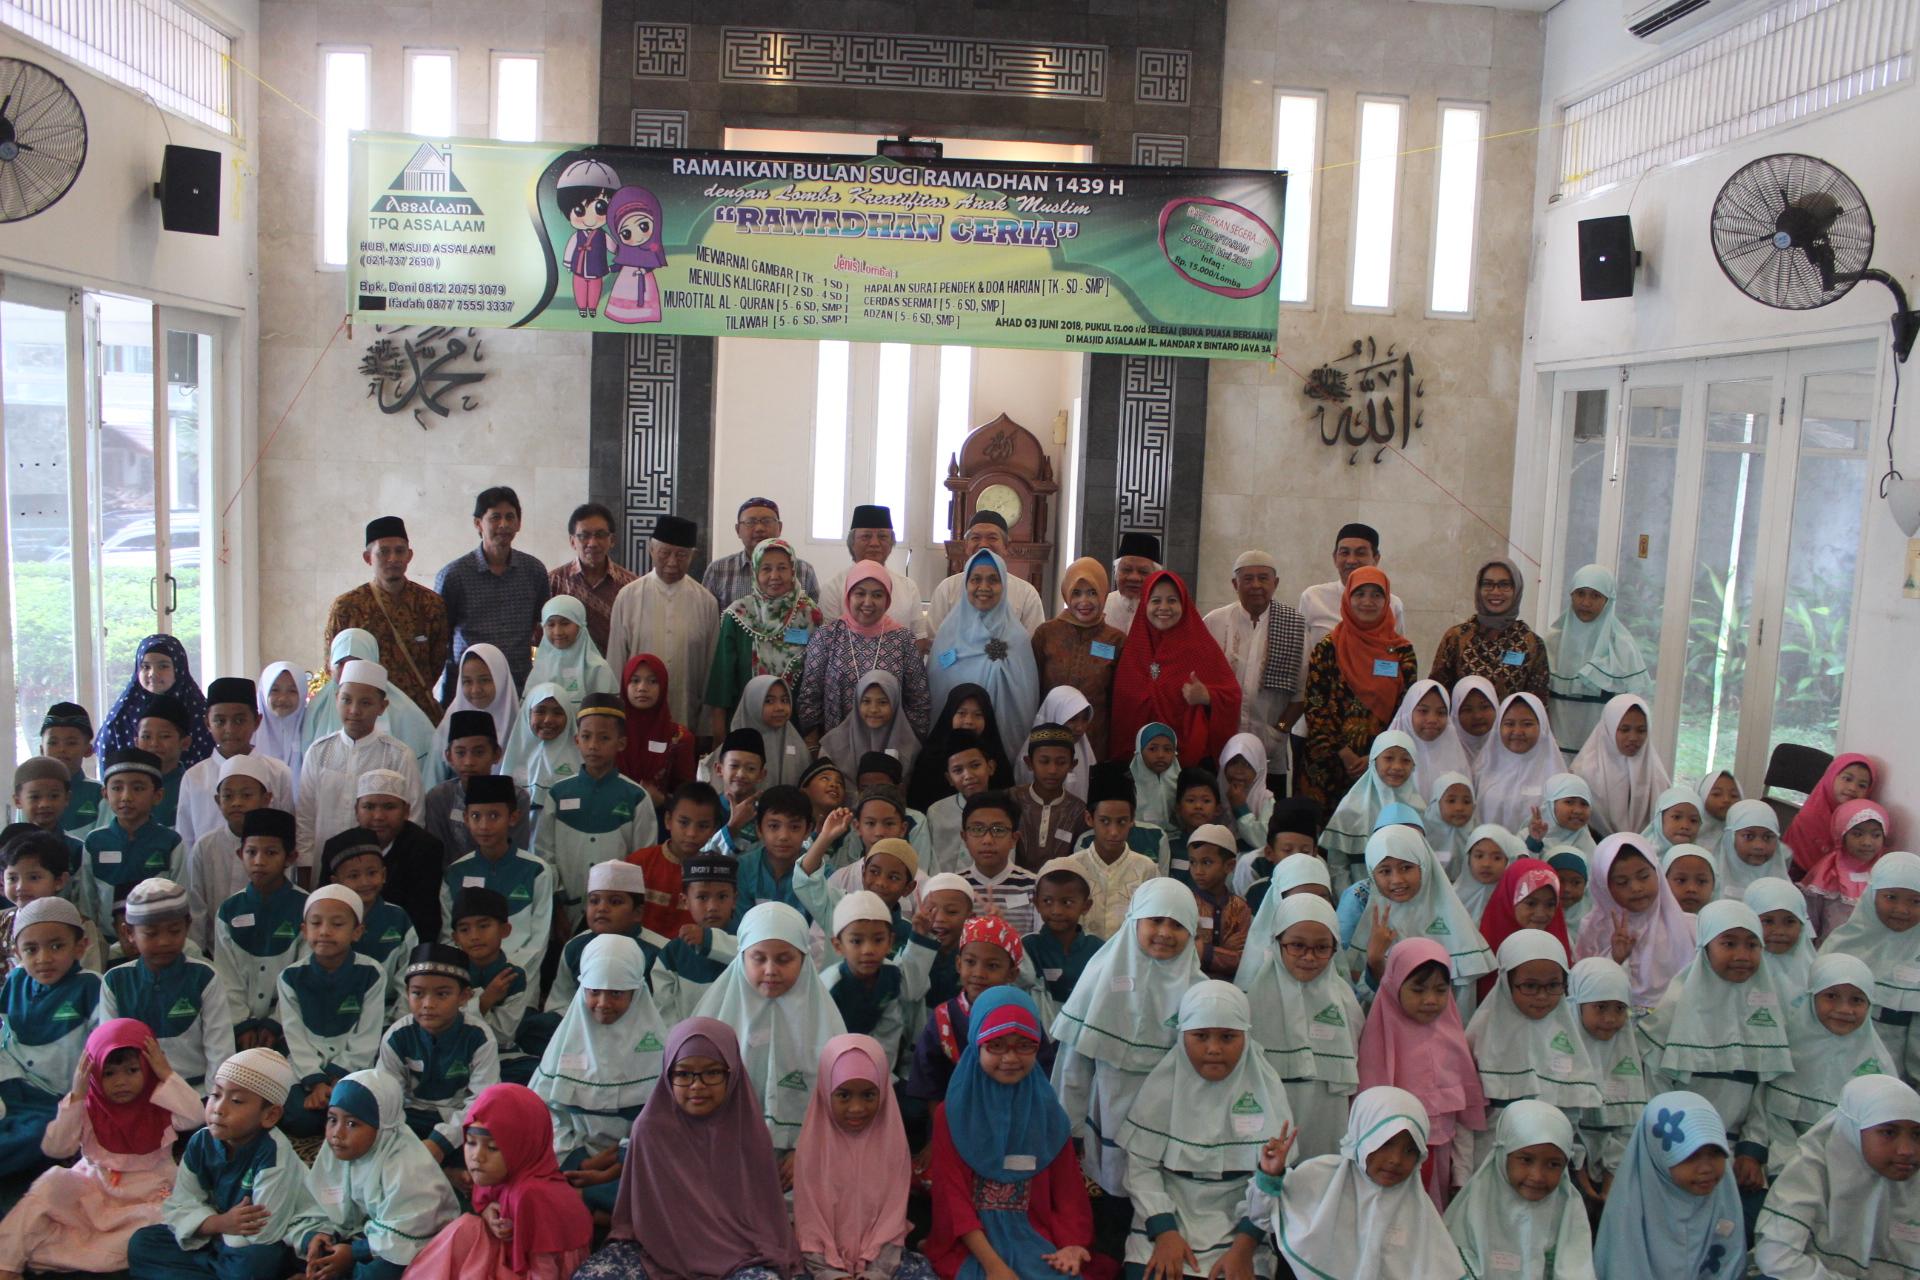 Lomba Kreatifitas Anak Muslim Di Masjid Assalaam Semakin Meriah Hijaubintaro